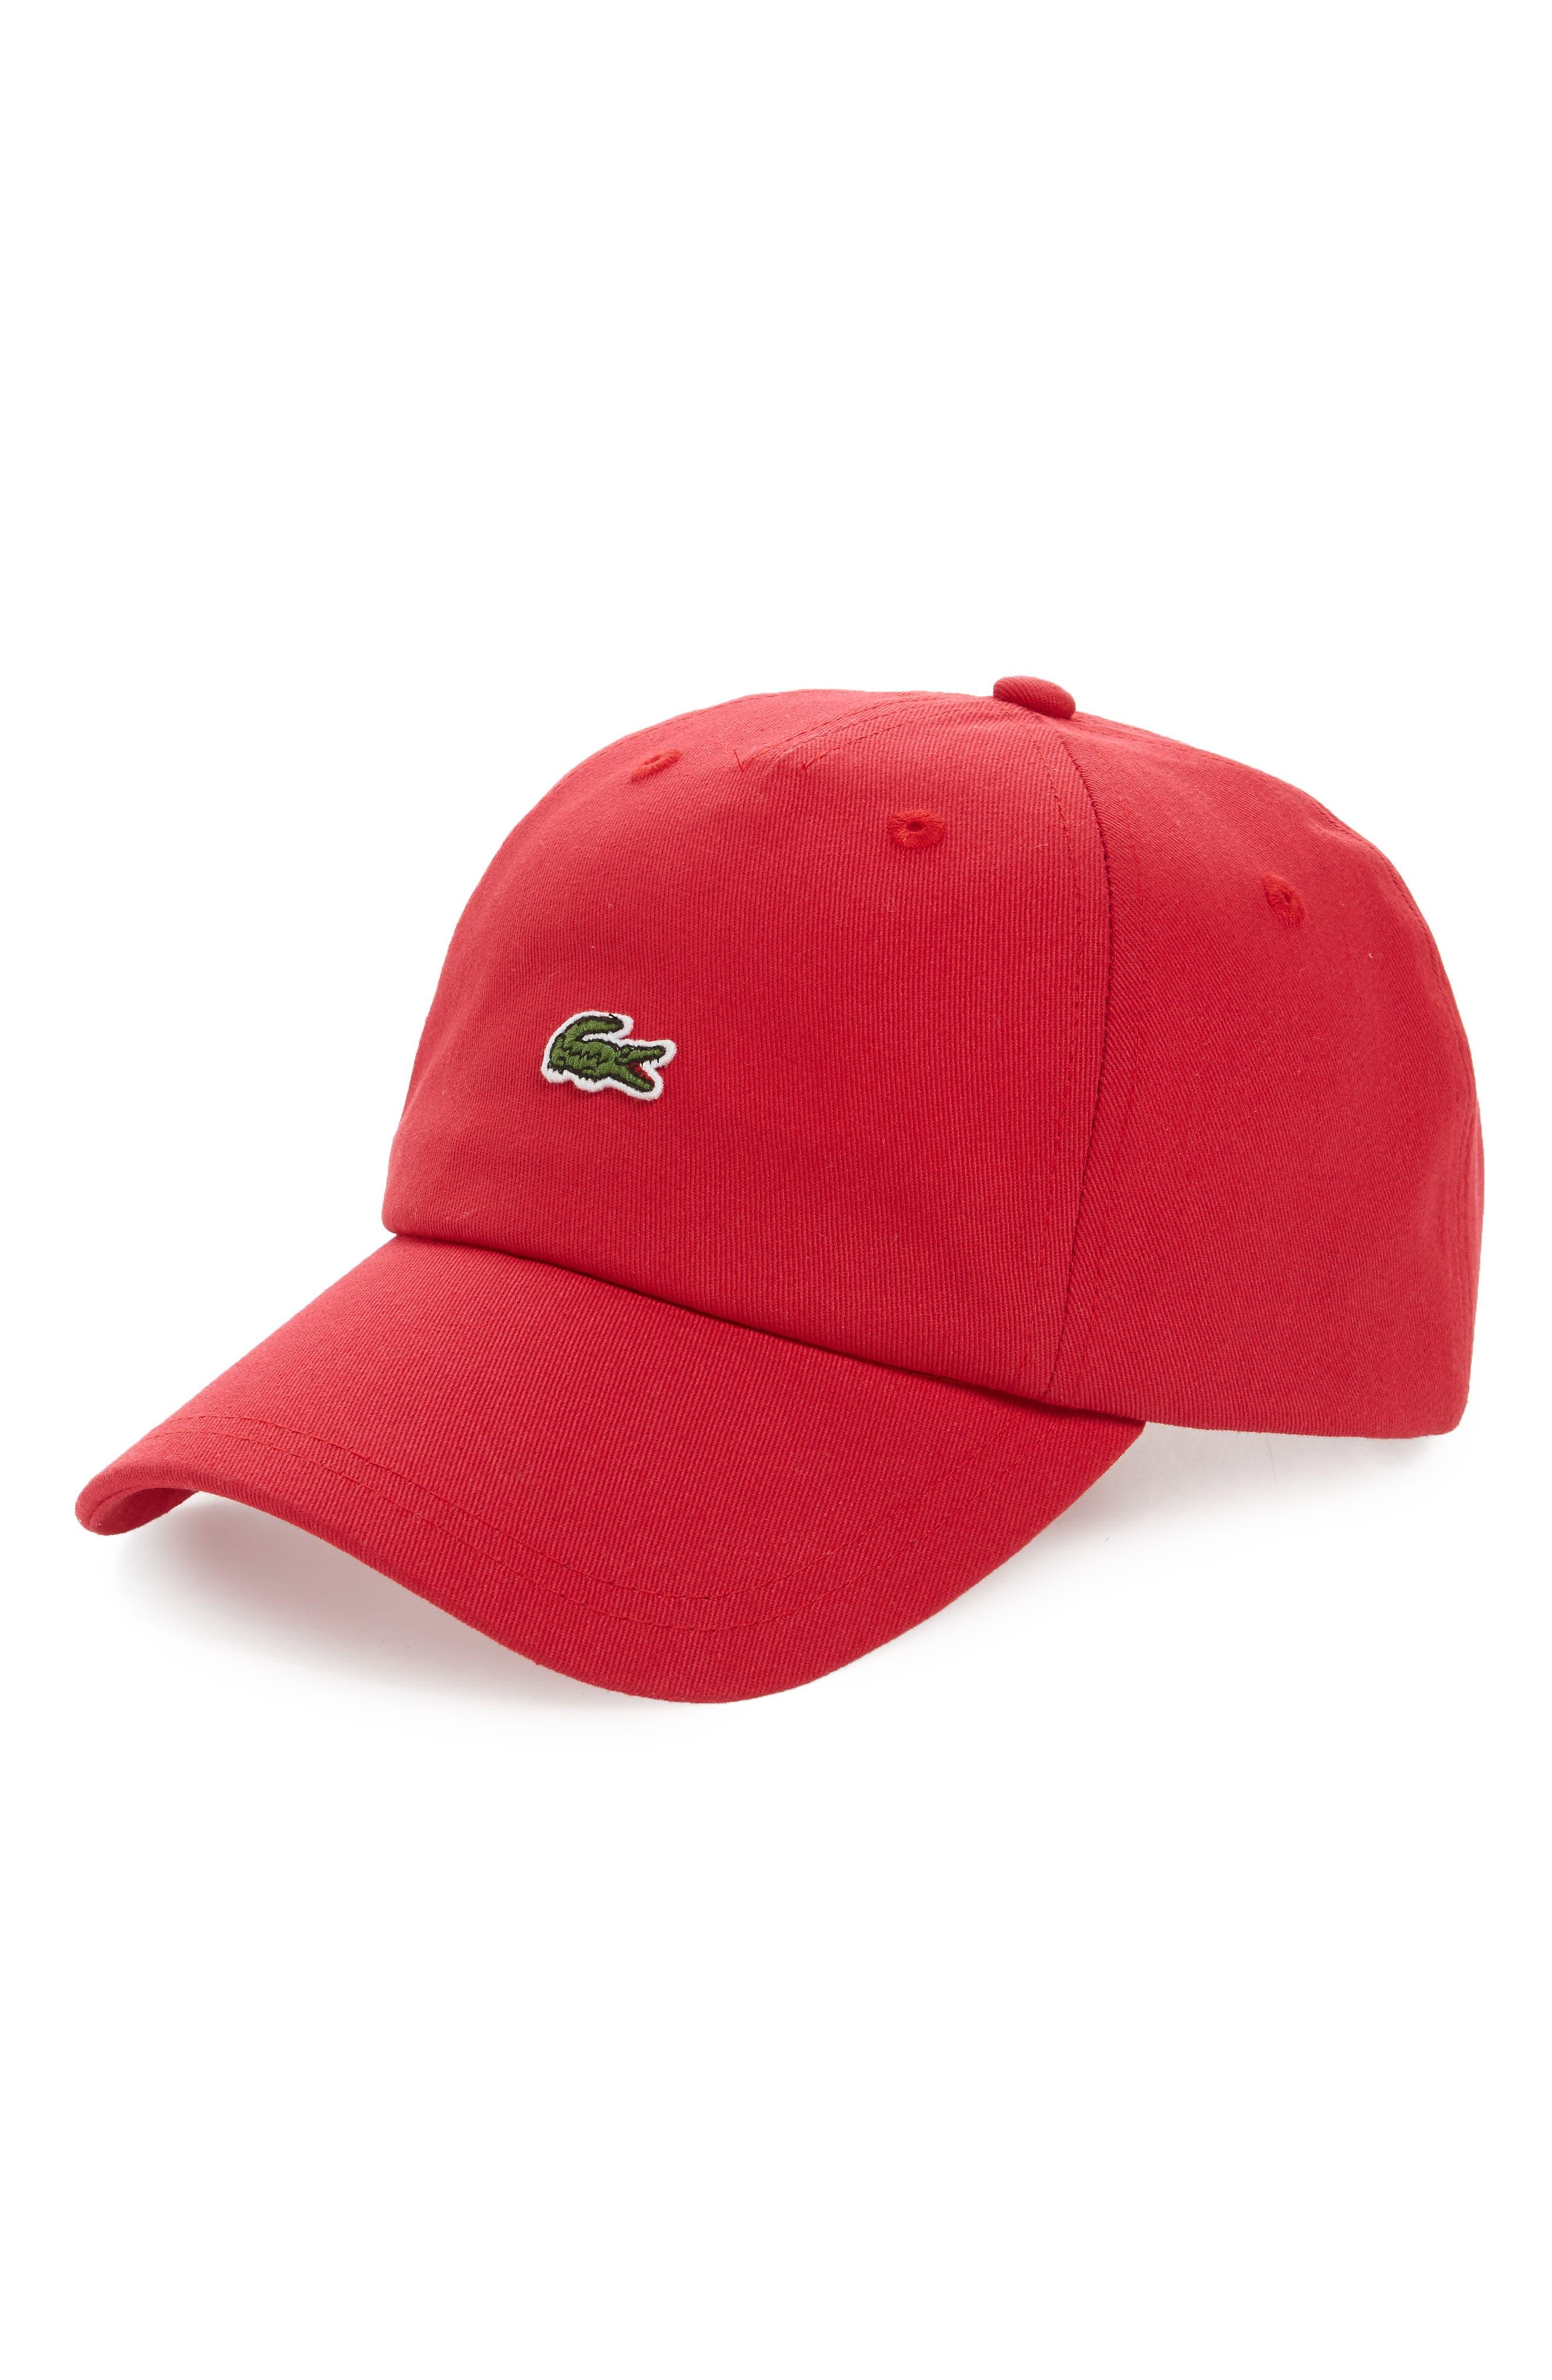 Lacoste Small Croc Baseball Cap